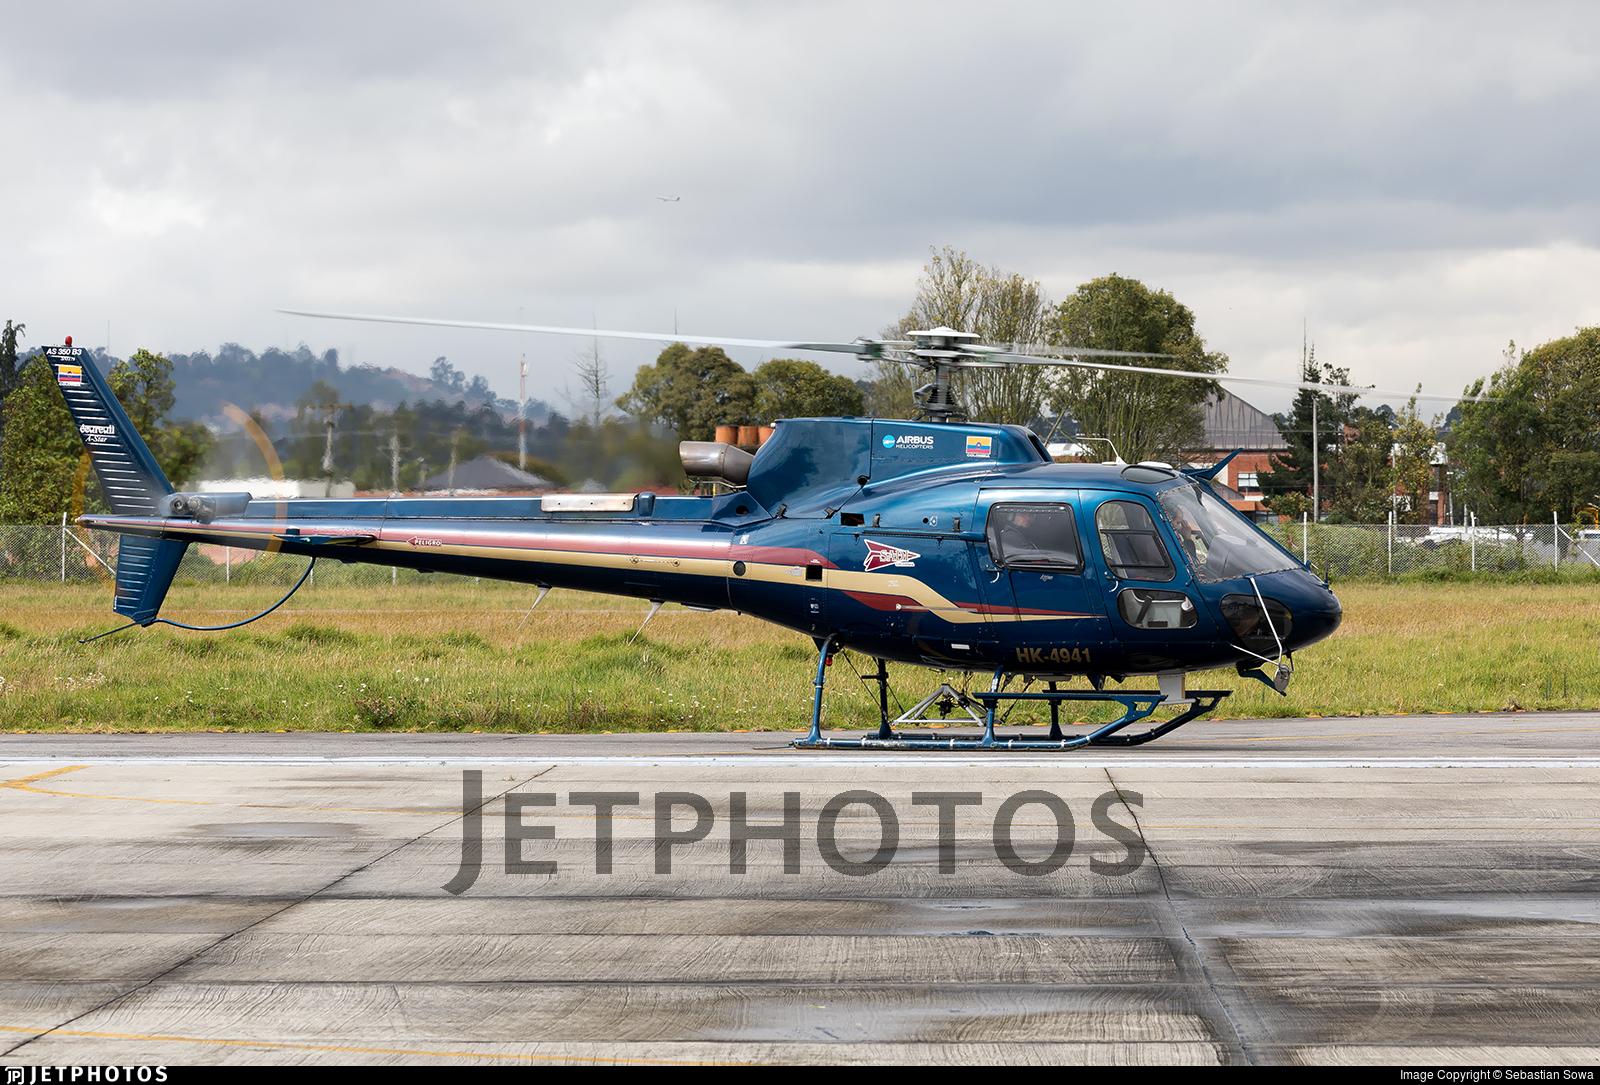 HK-4941 - Eurocopter AS 350 Ecureuil - SADI Colombia (Servicios Aereos de Ibague)